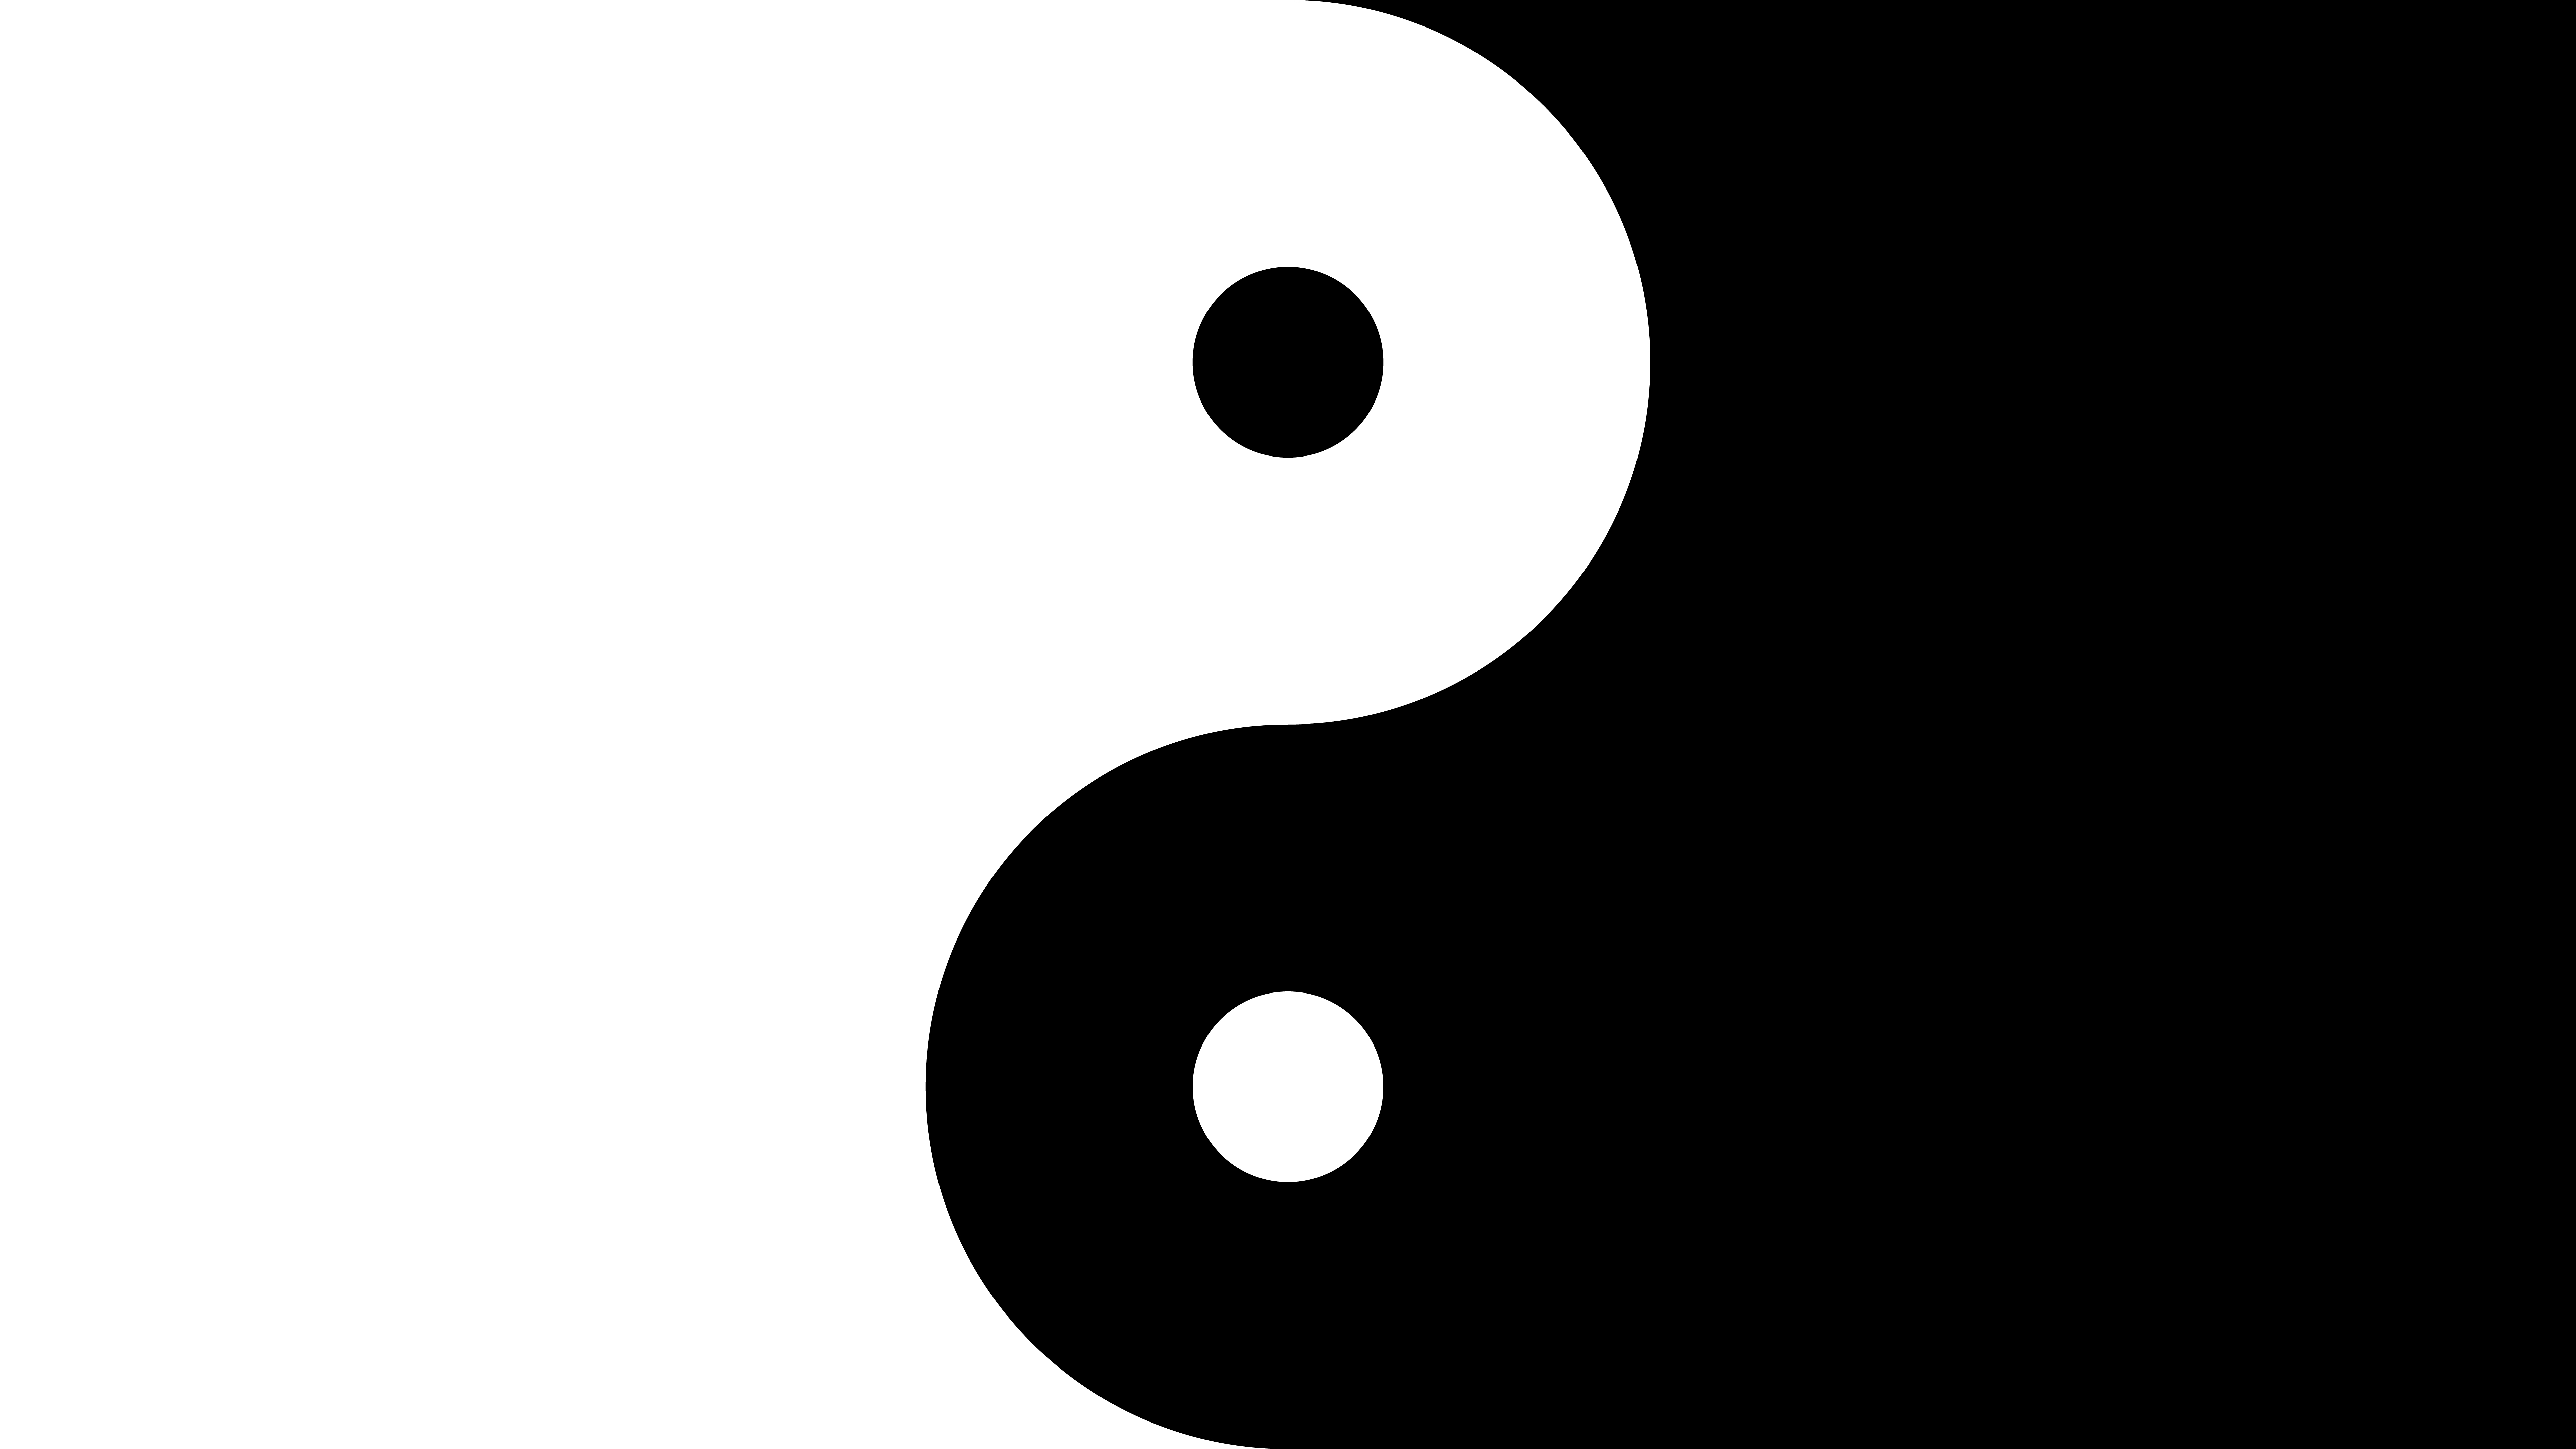 Fondos de pantalla Yin y yang